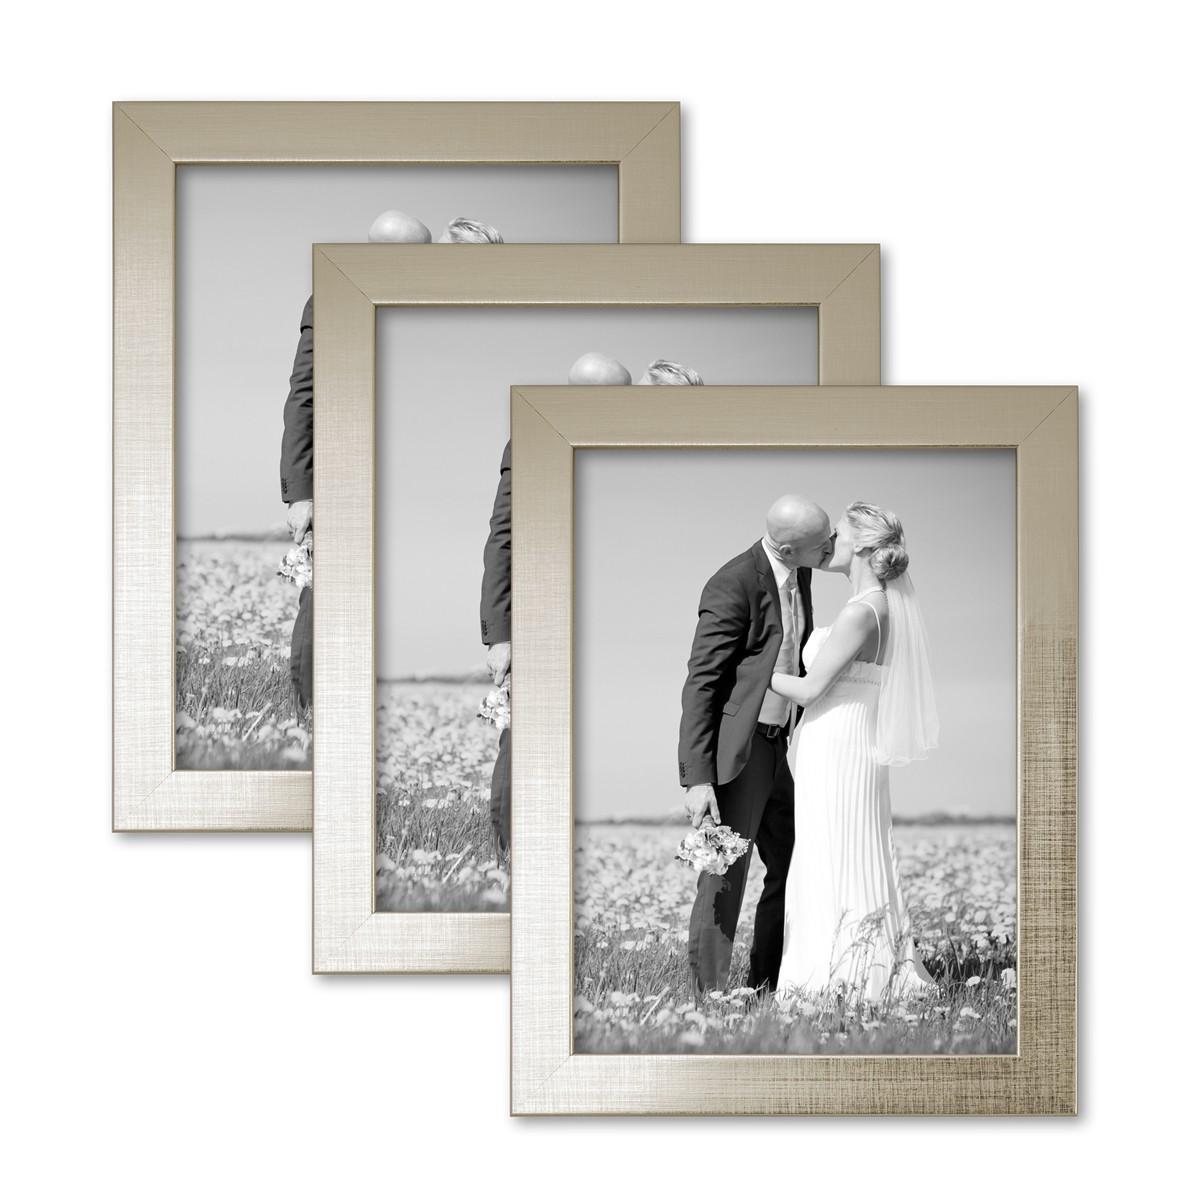 3er set bilderrahmen 15x20 cm silber modern massivholz rahmen mit glasscheibe inkl zubeh r. Black Bedroom Furniture Sets. Home Design Ideas